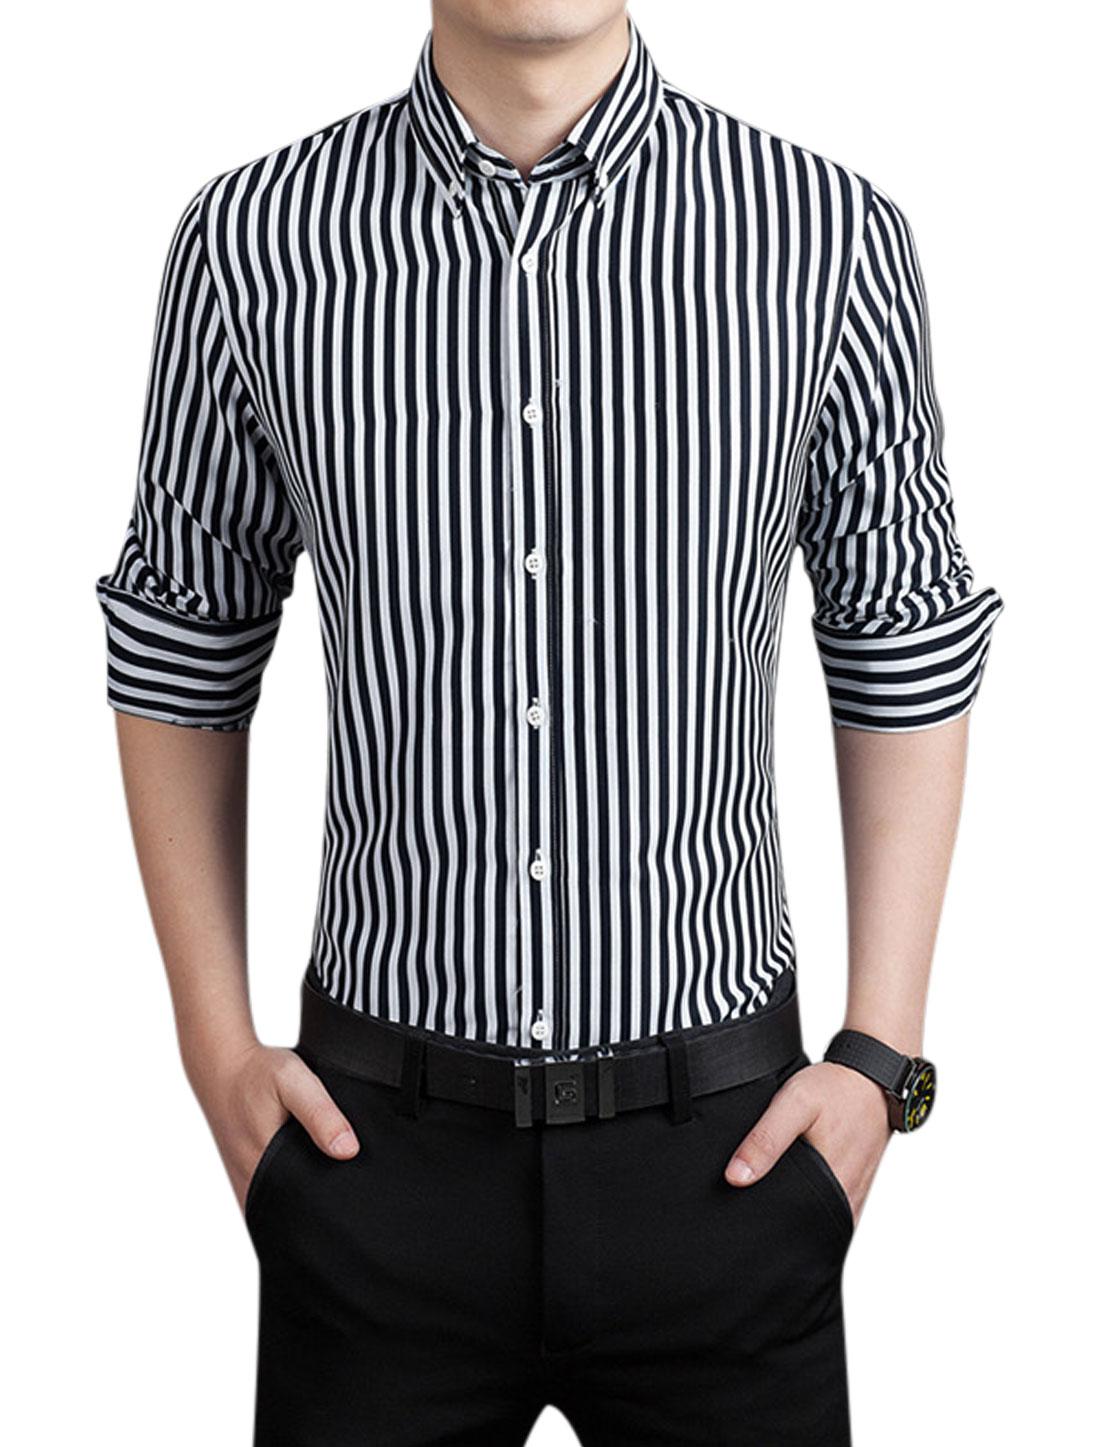 Men Point Collar Button Closed Stripes Shirt Navy Blue M